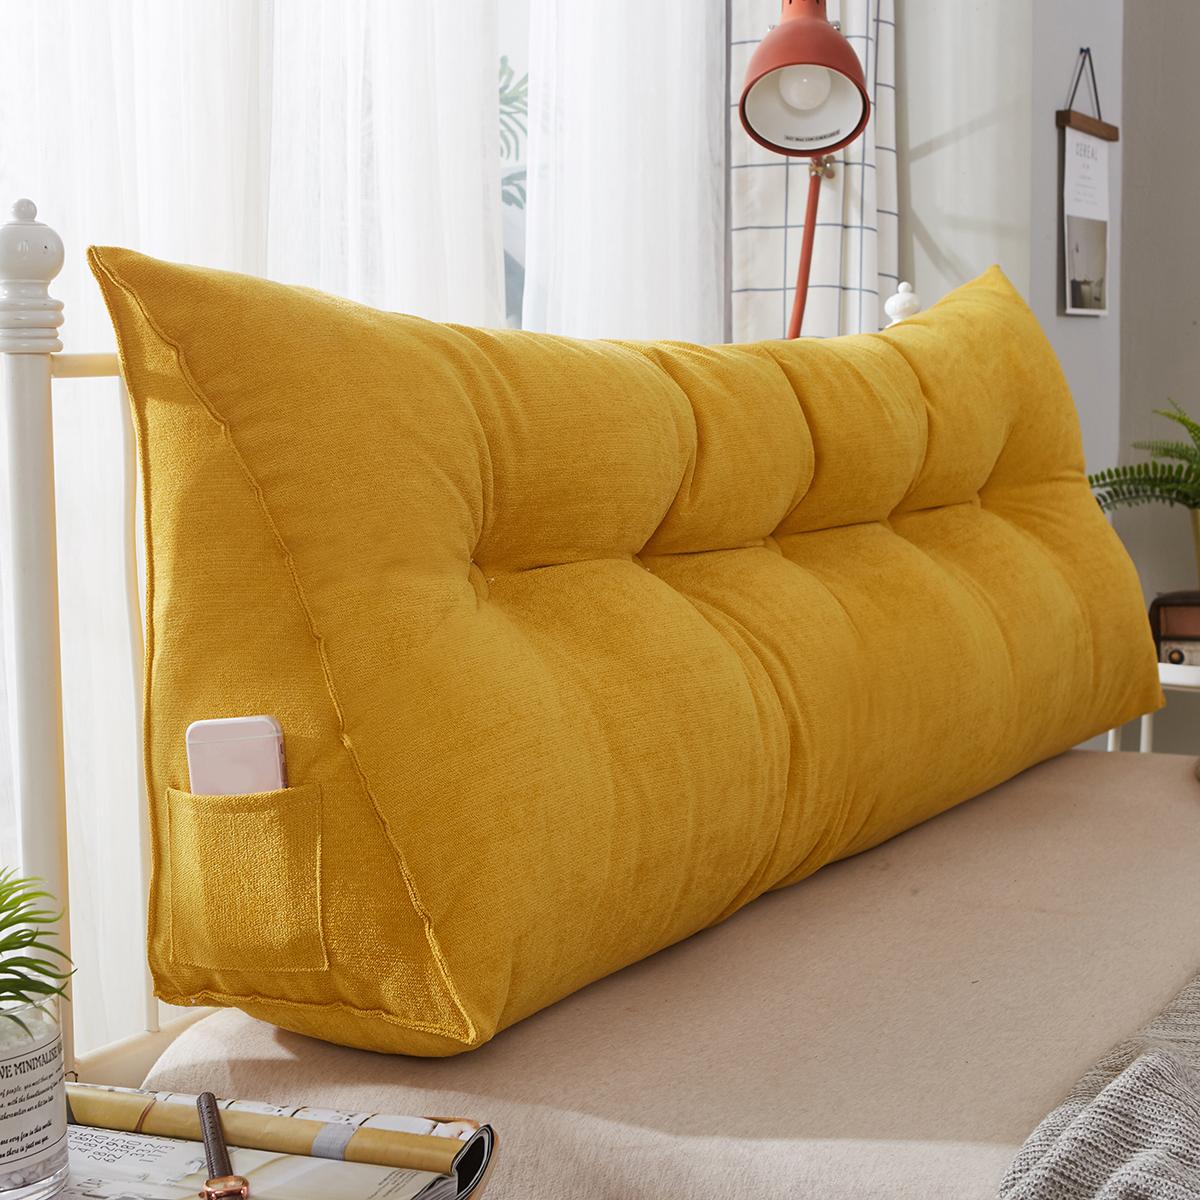 60cm wedge cushion reading pillow back